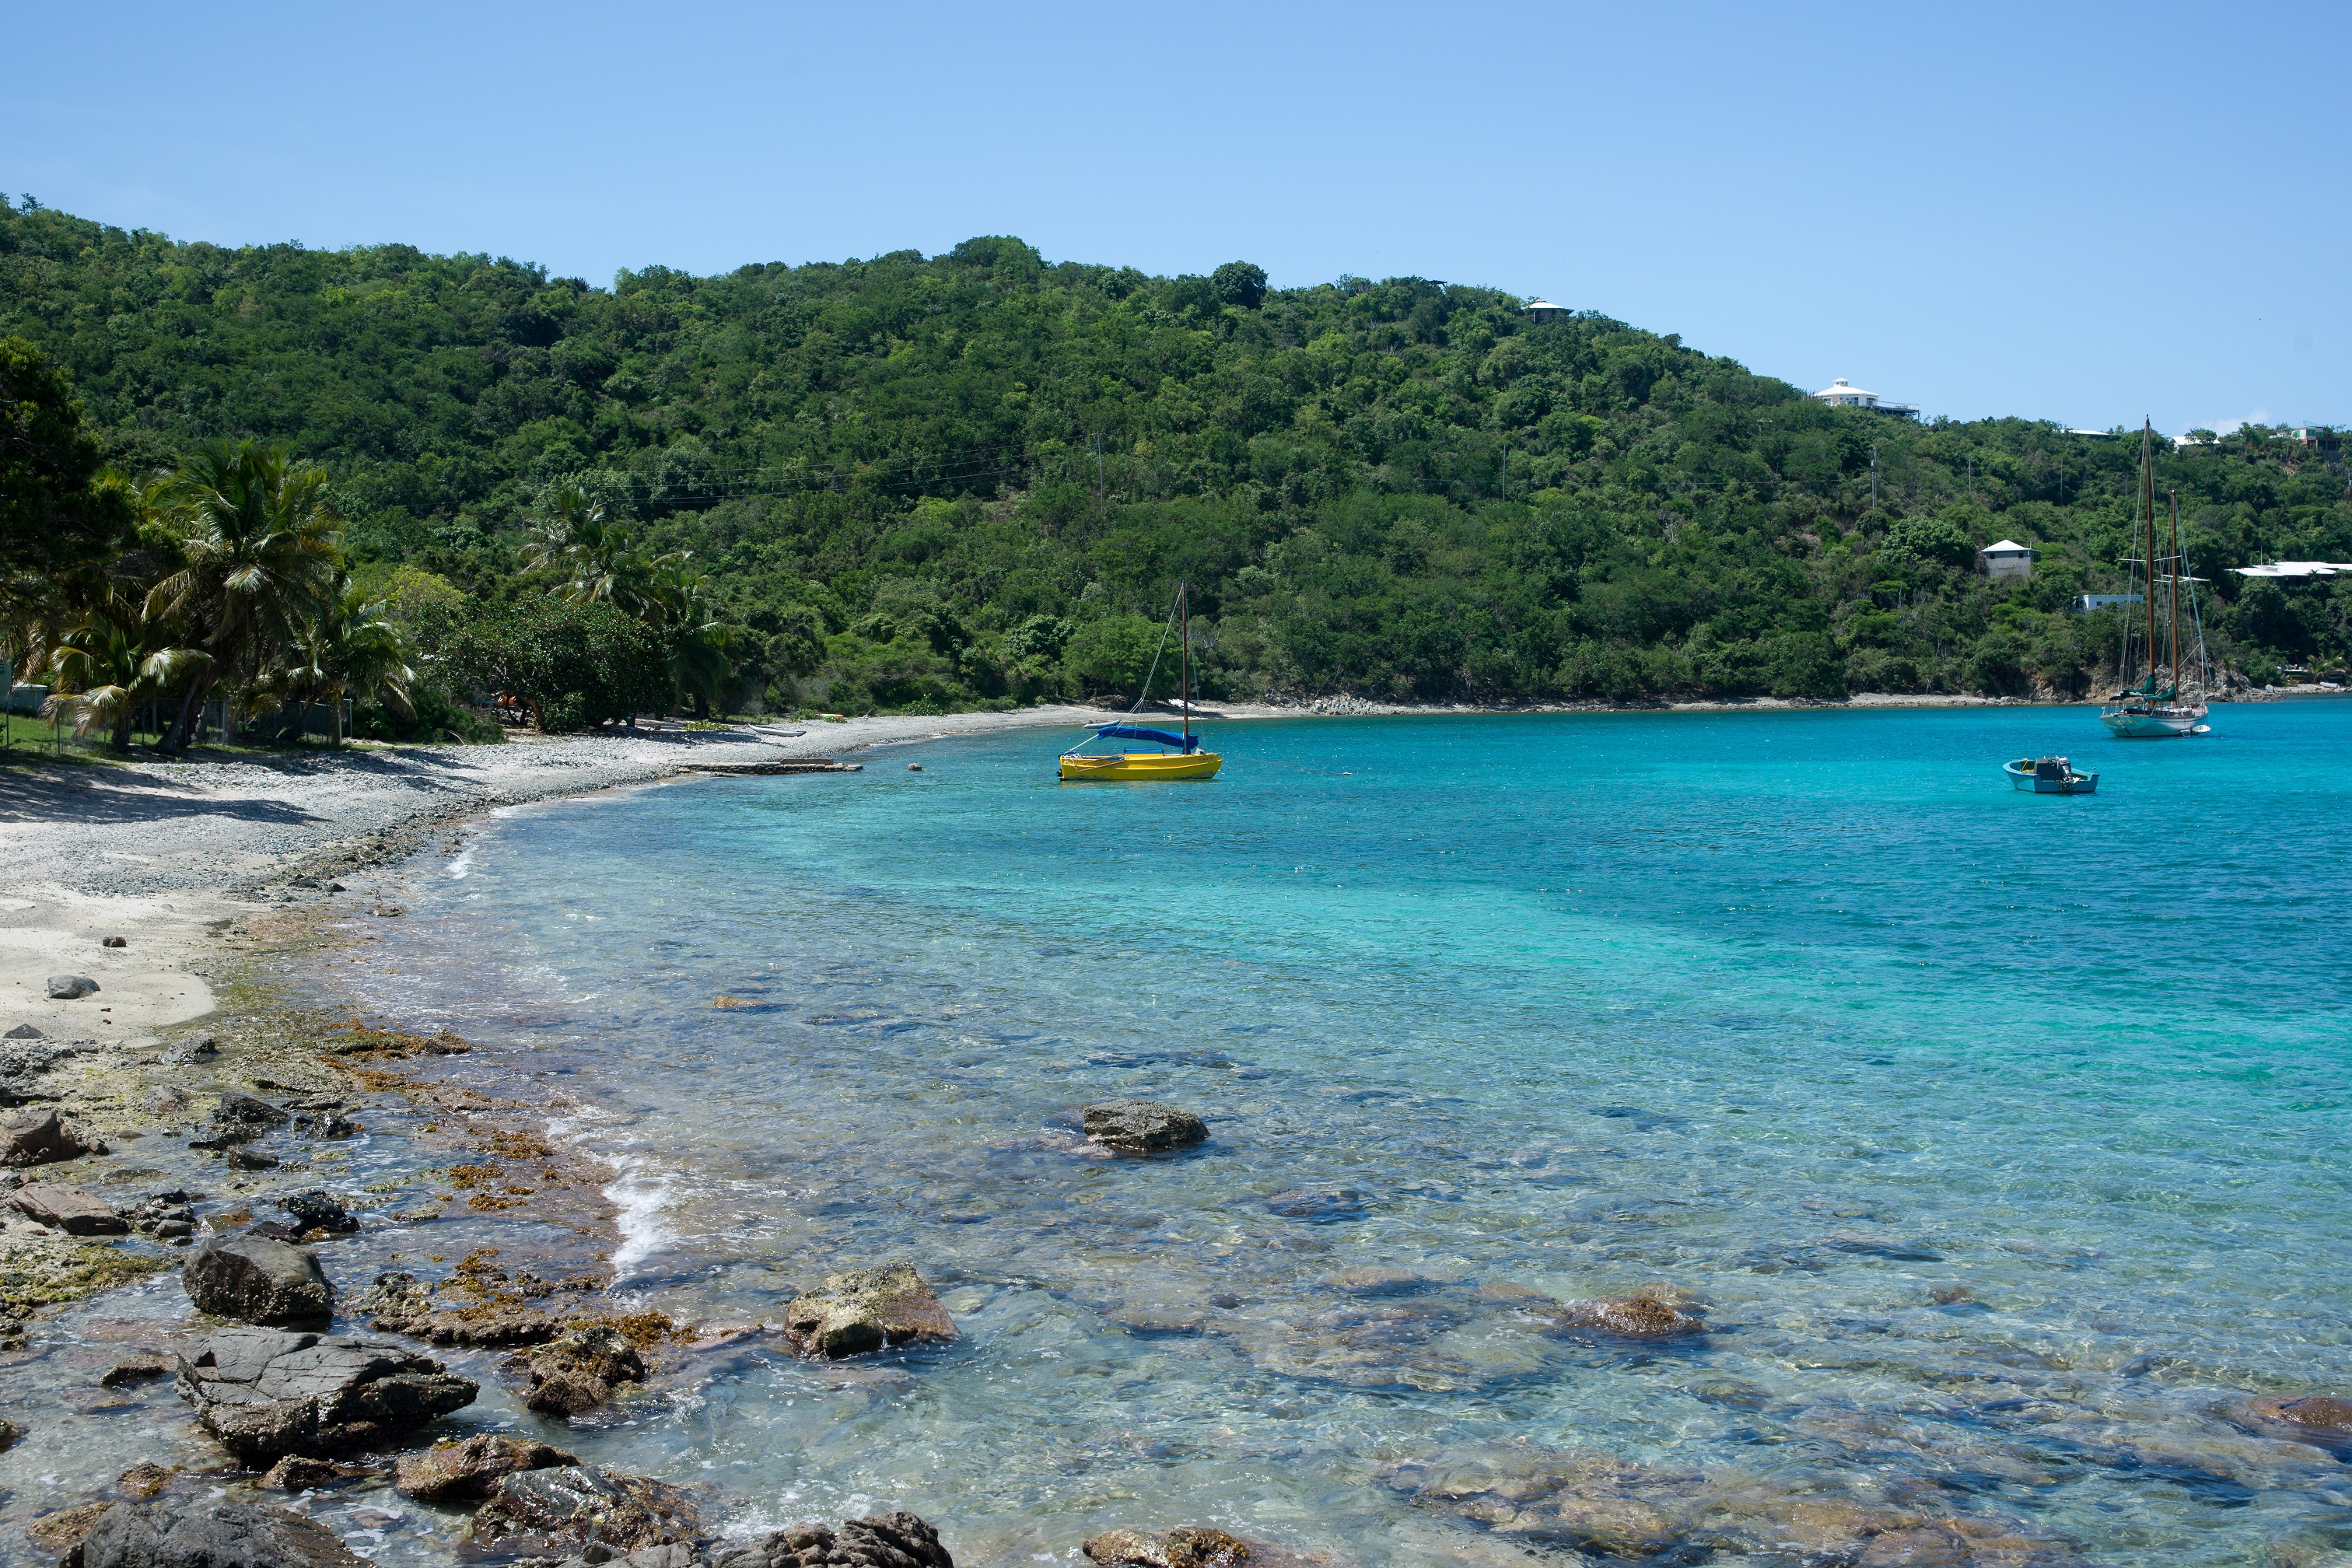 Views of the Island - Hansen Bay